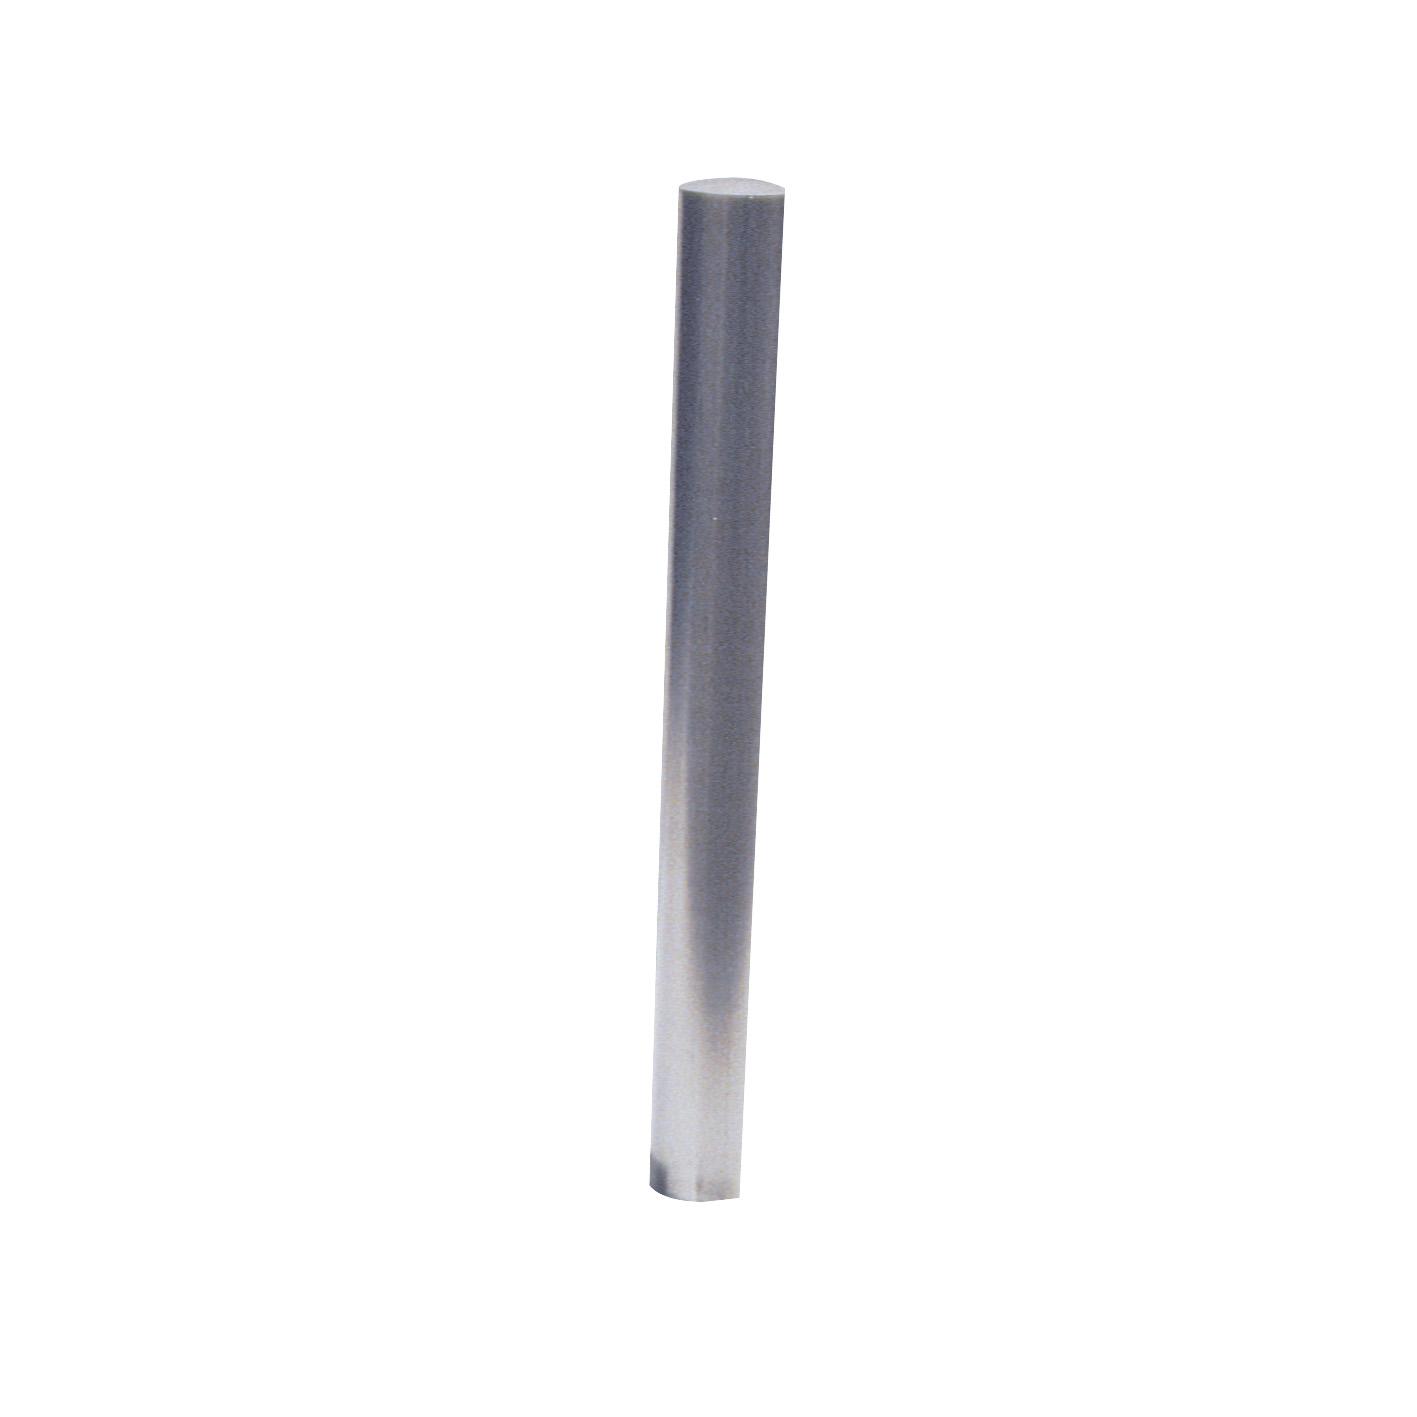 Edelstahlpfosten 40155 | Ø 154 x 950 mm